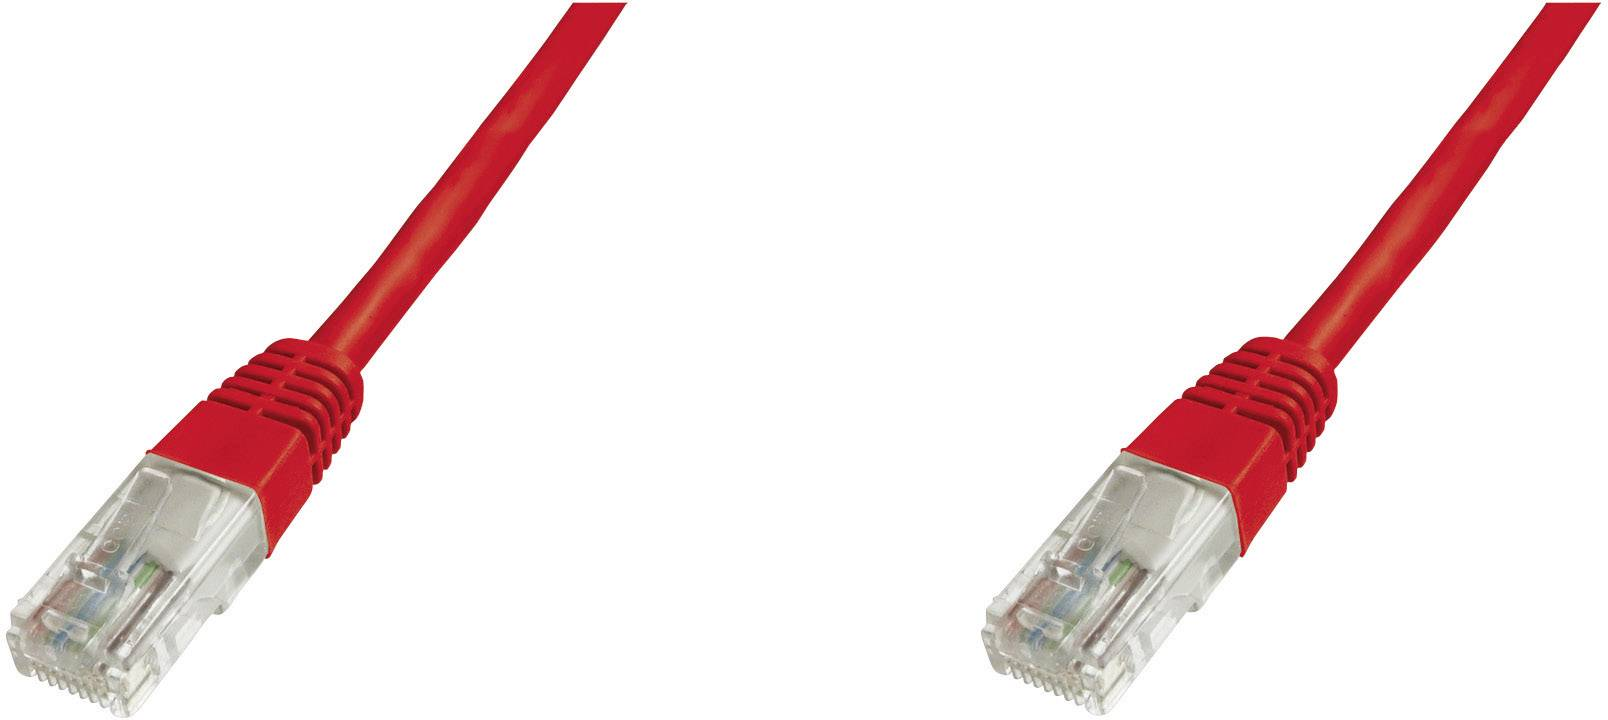 Síťový kabel RJ45 Digitus Professional DK-1511-030/R, CAT 5e, U/UTP, 3 m, červená